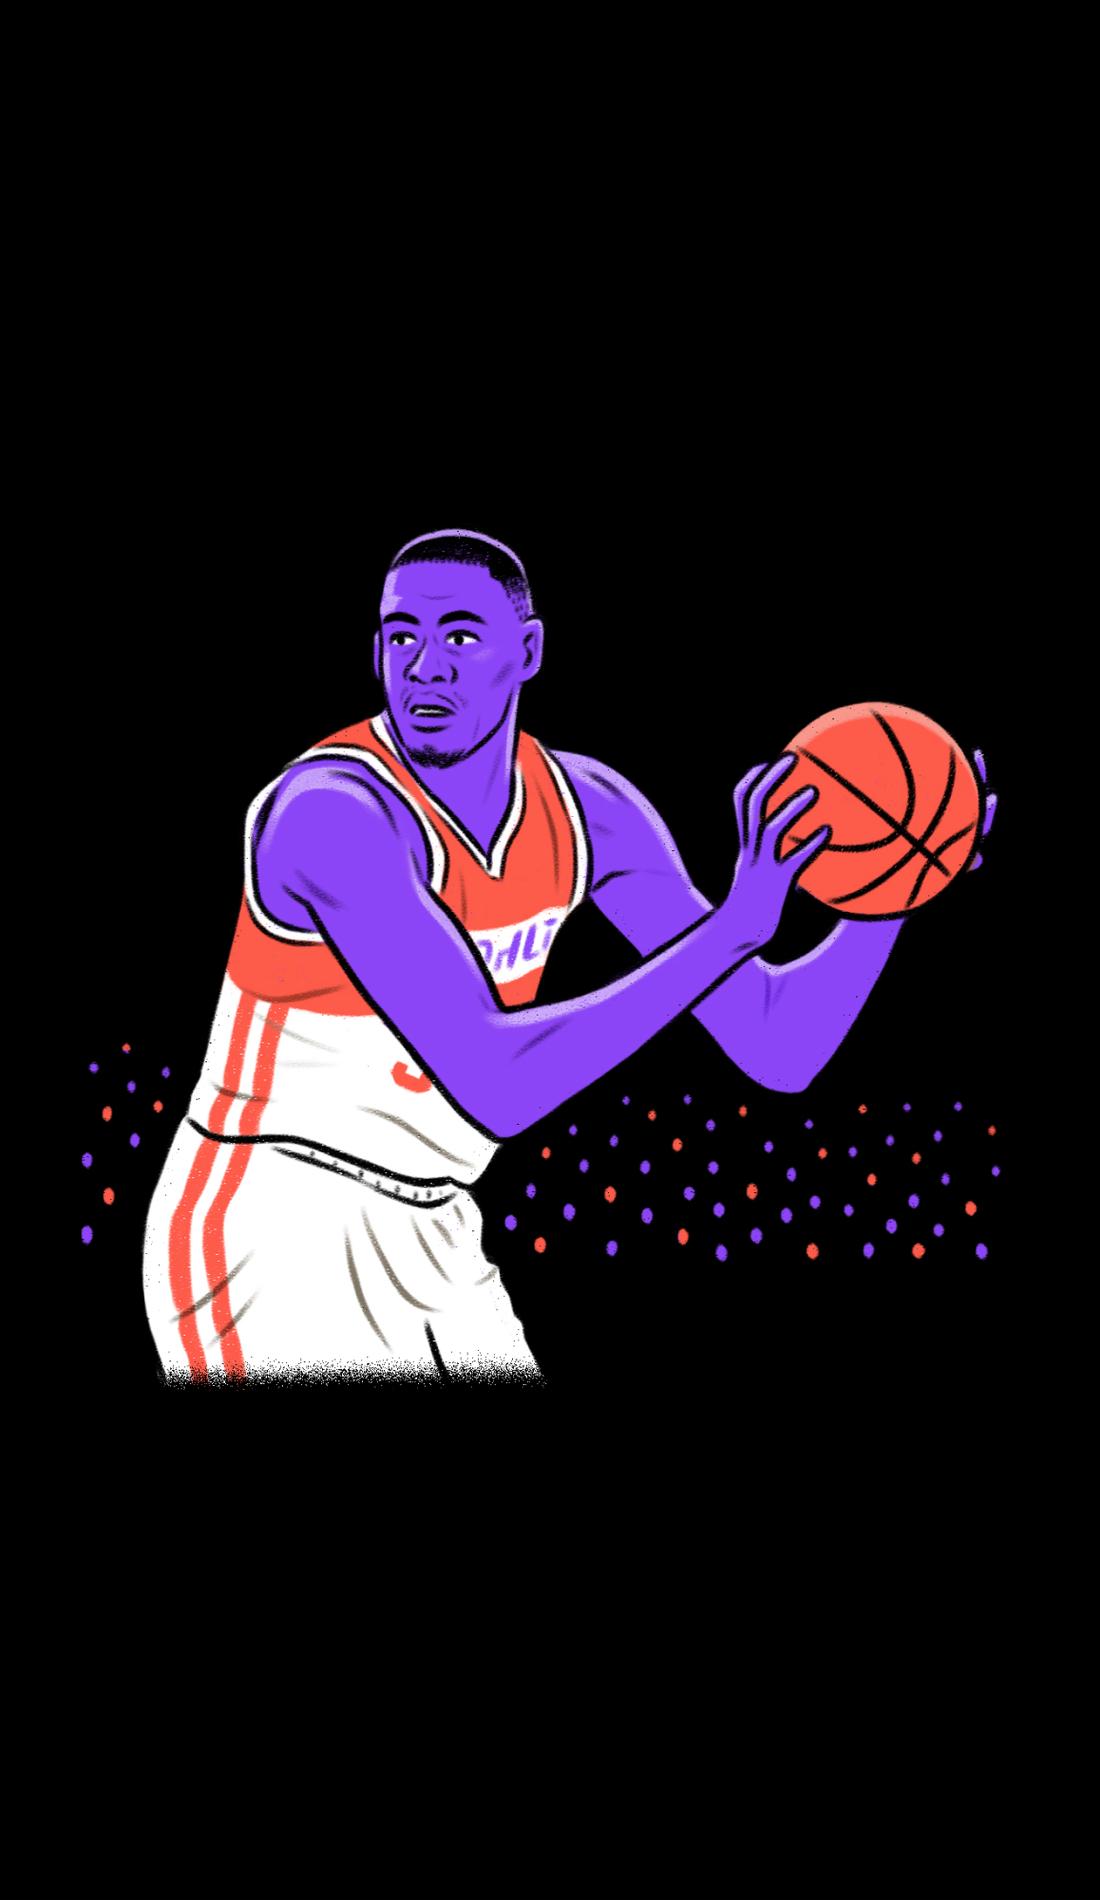 A Washington Huskies Basketball live event